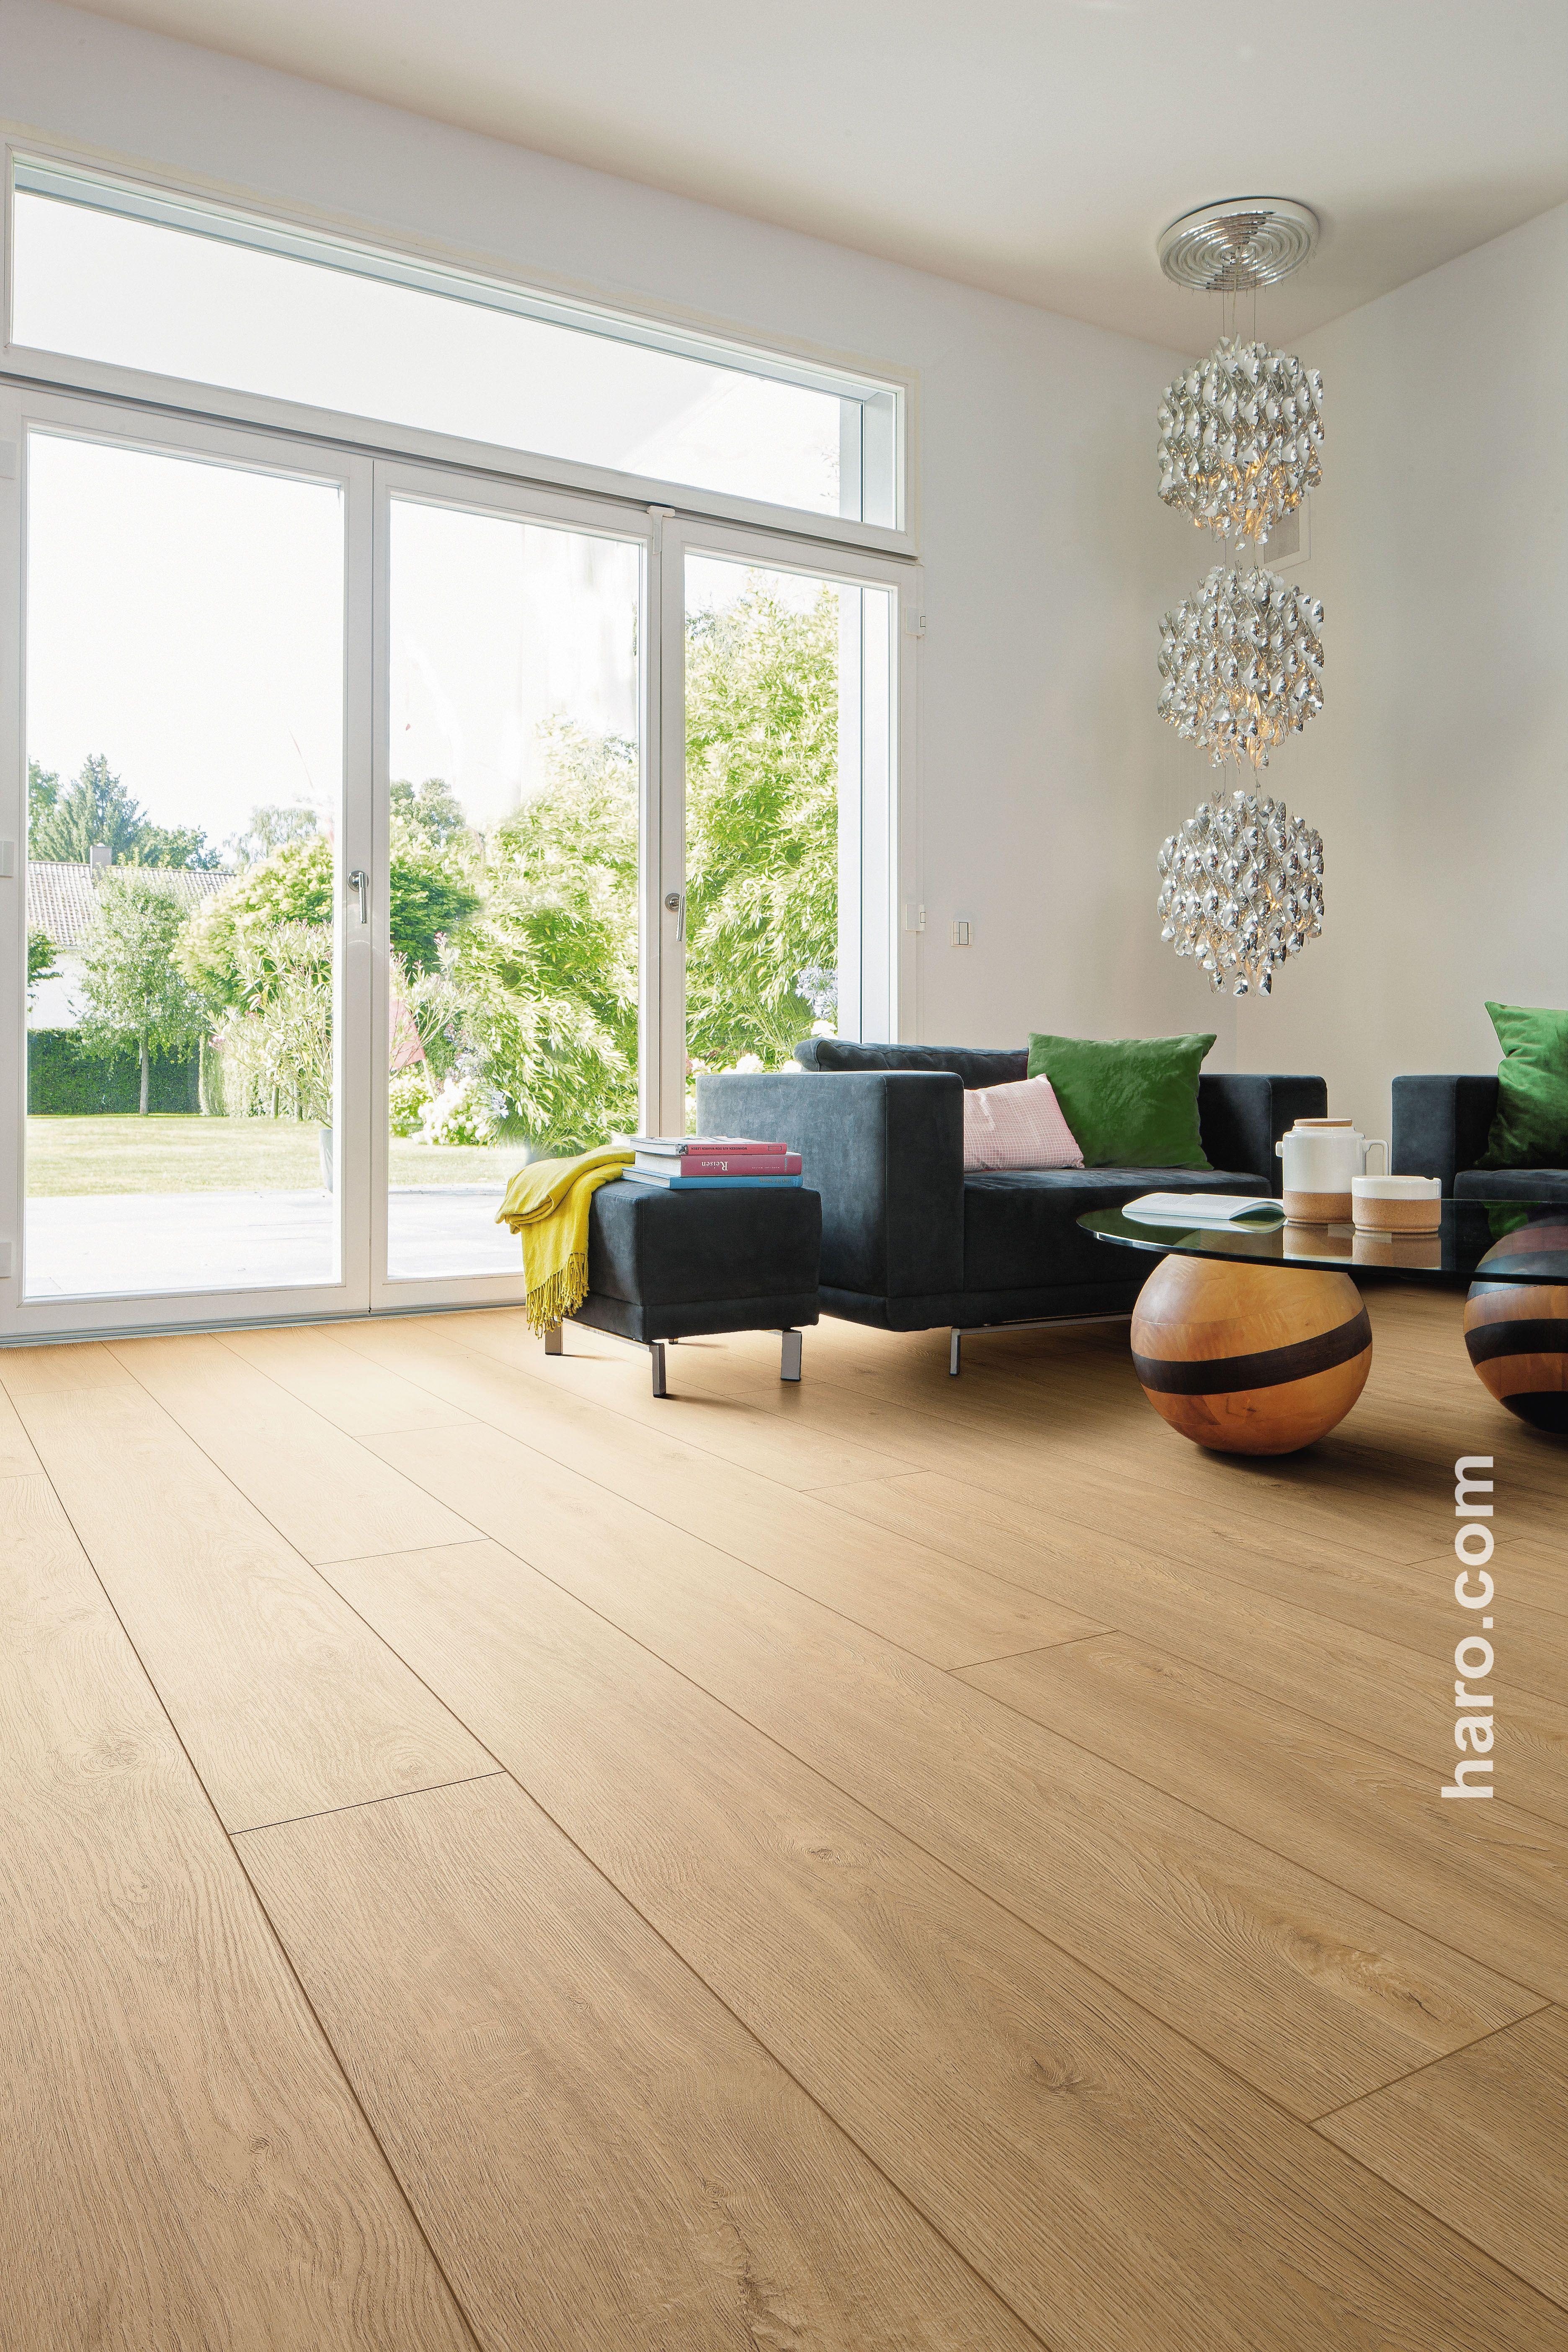 DISANO by HARO Classic Landhausdiele XL 4V Eiche | Living room ...